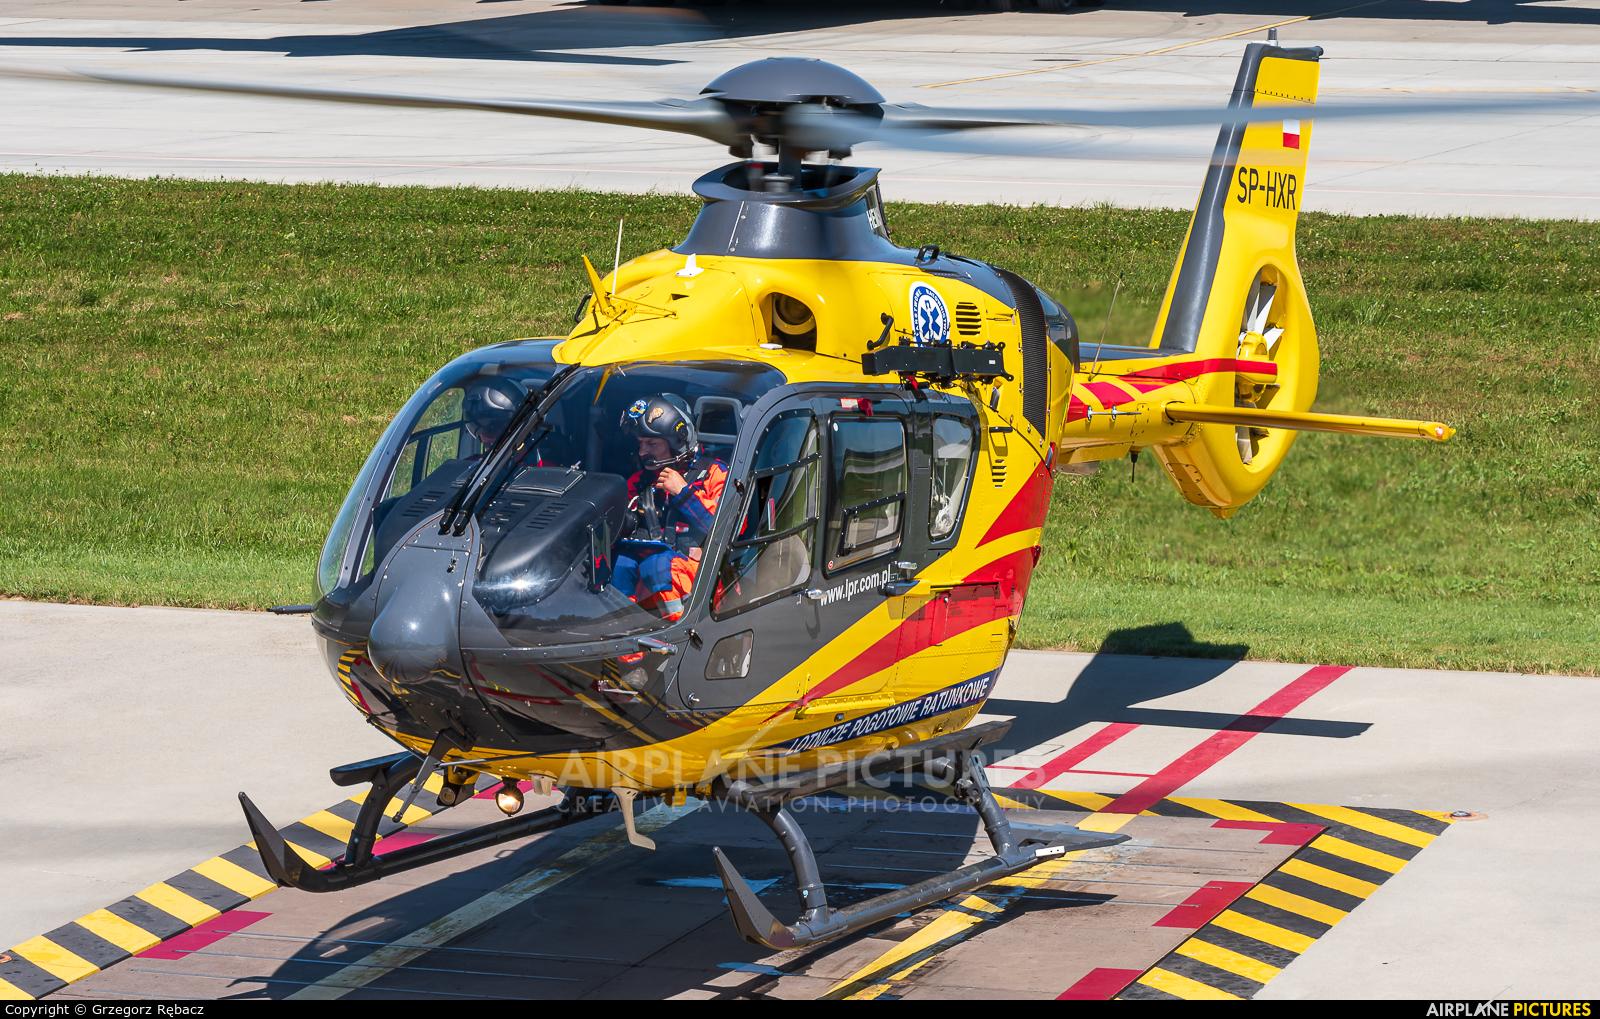 Polish Medical Air Rescue - Lotnicze Pogotowie Ratunkowe SP-HXR aircraft at Kraków - John Paul II Intl